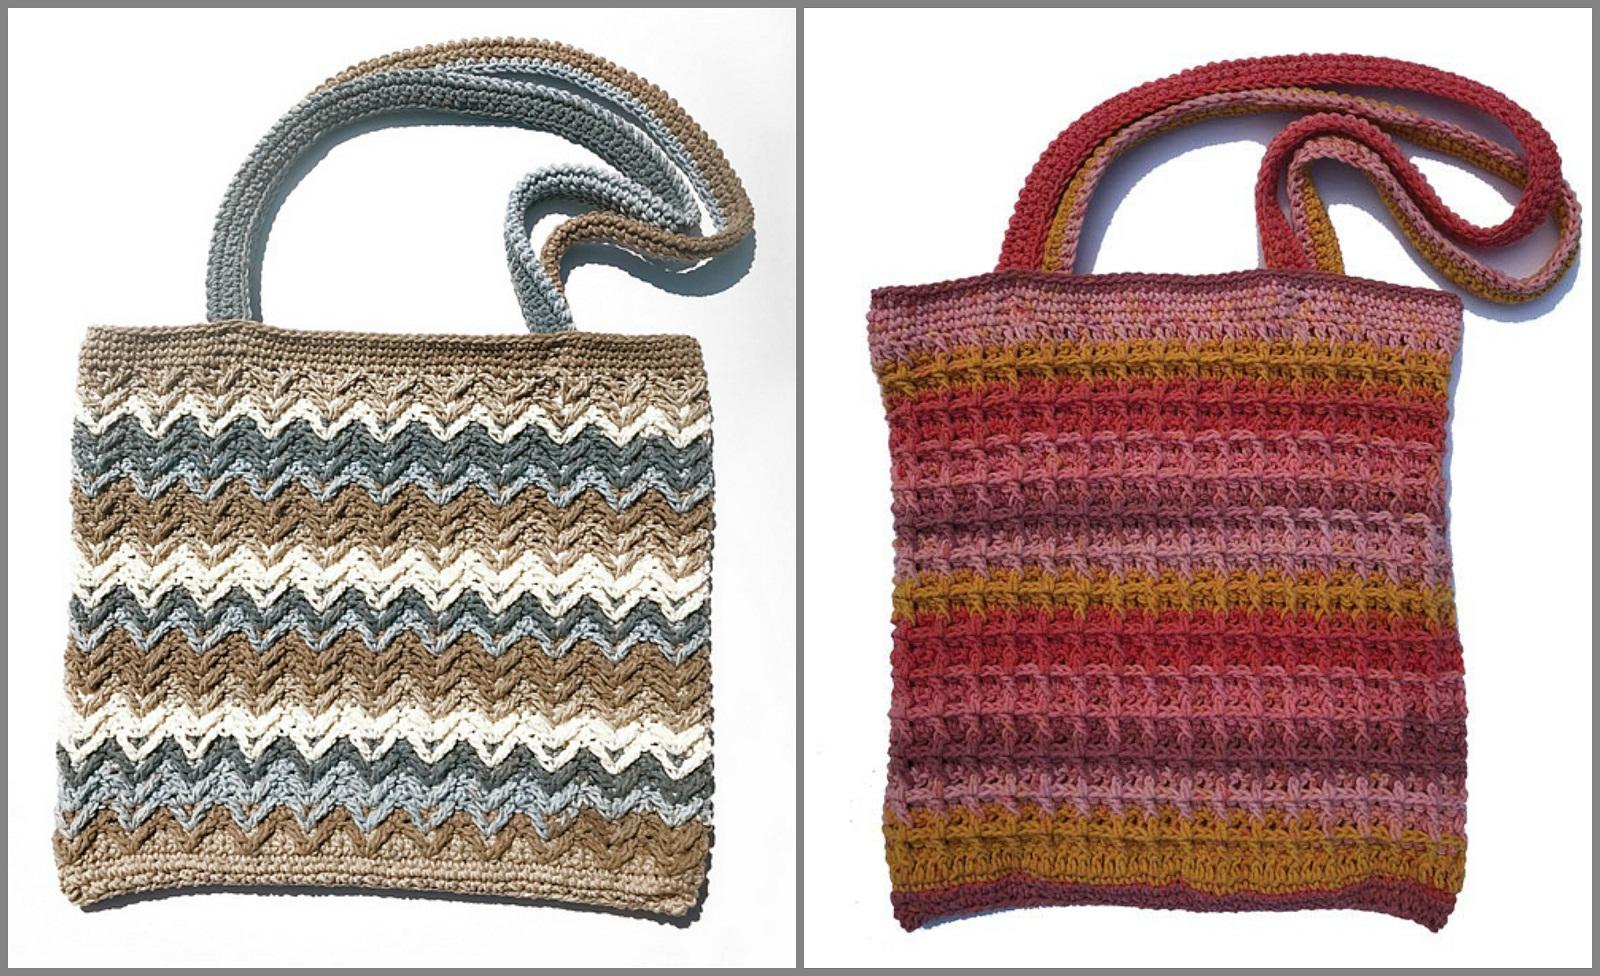 Crochet Bag Free Patterns Yarn Hooks